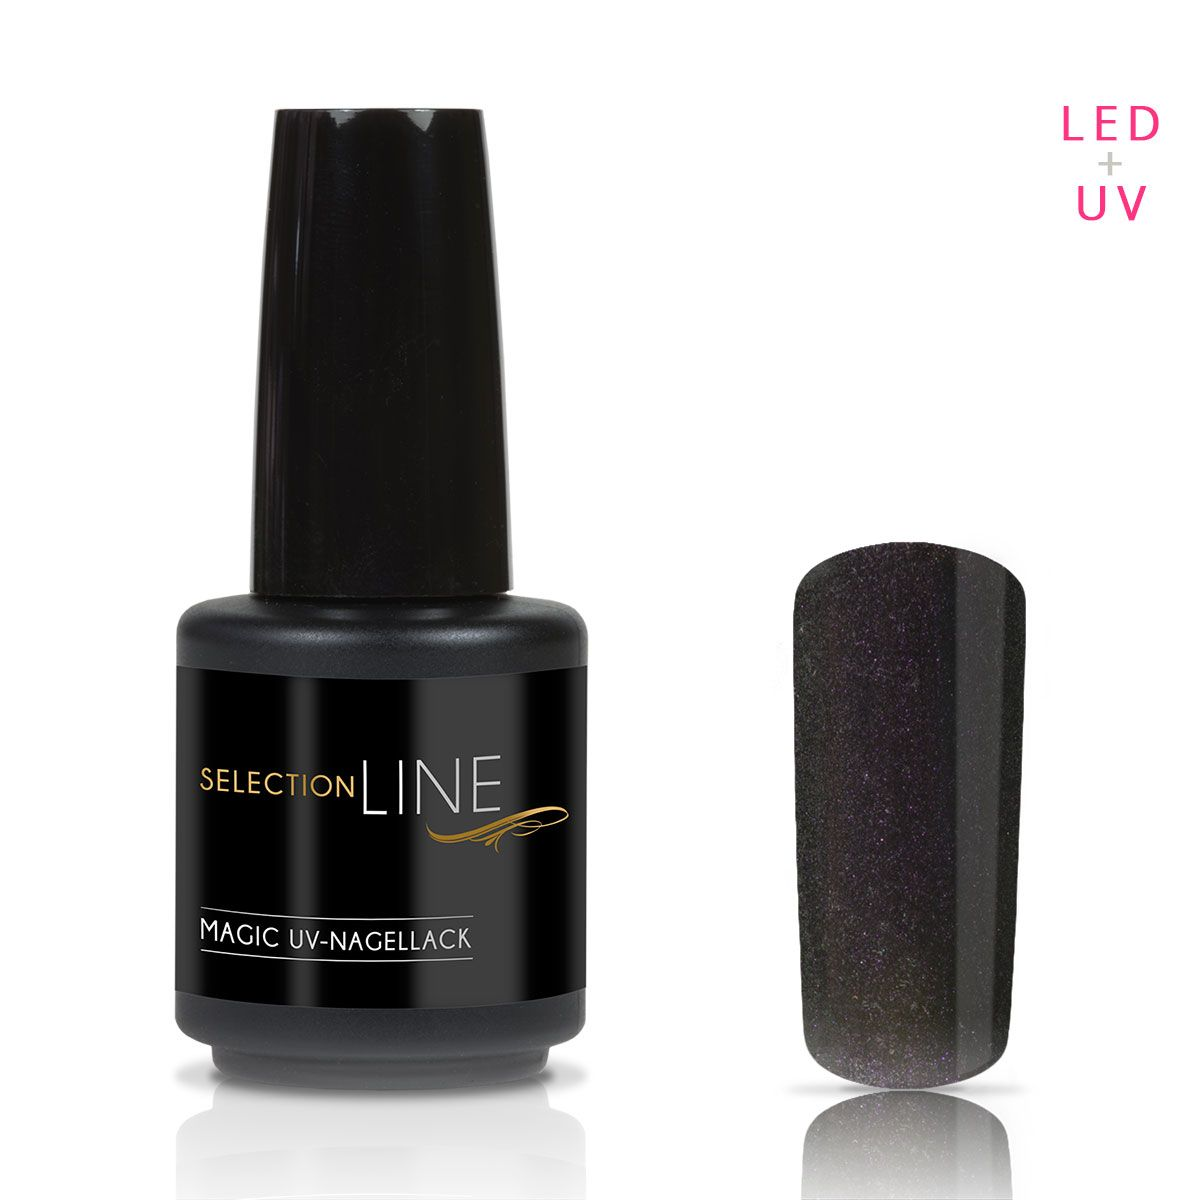 Selection Line Magic UV Nagellack | NAILS FACTORY